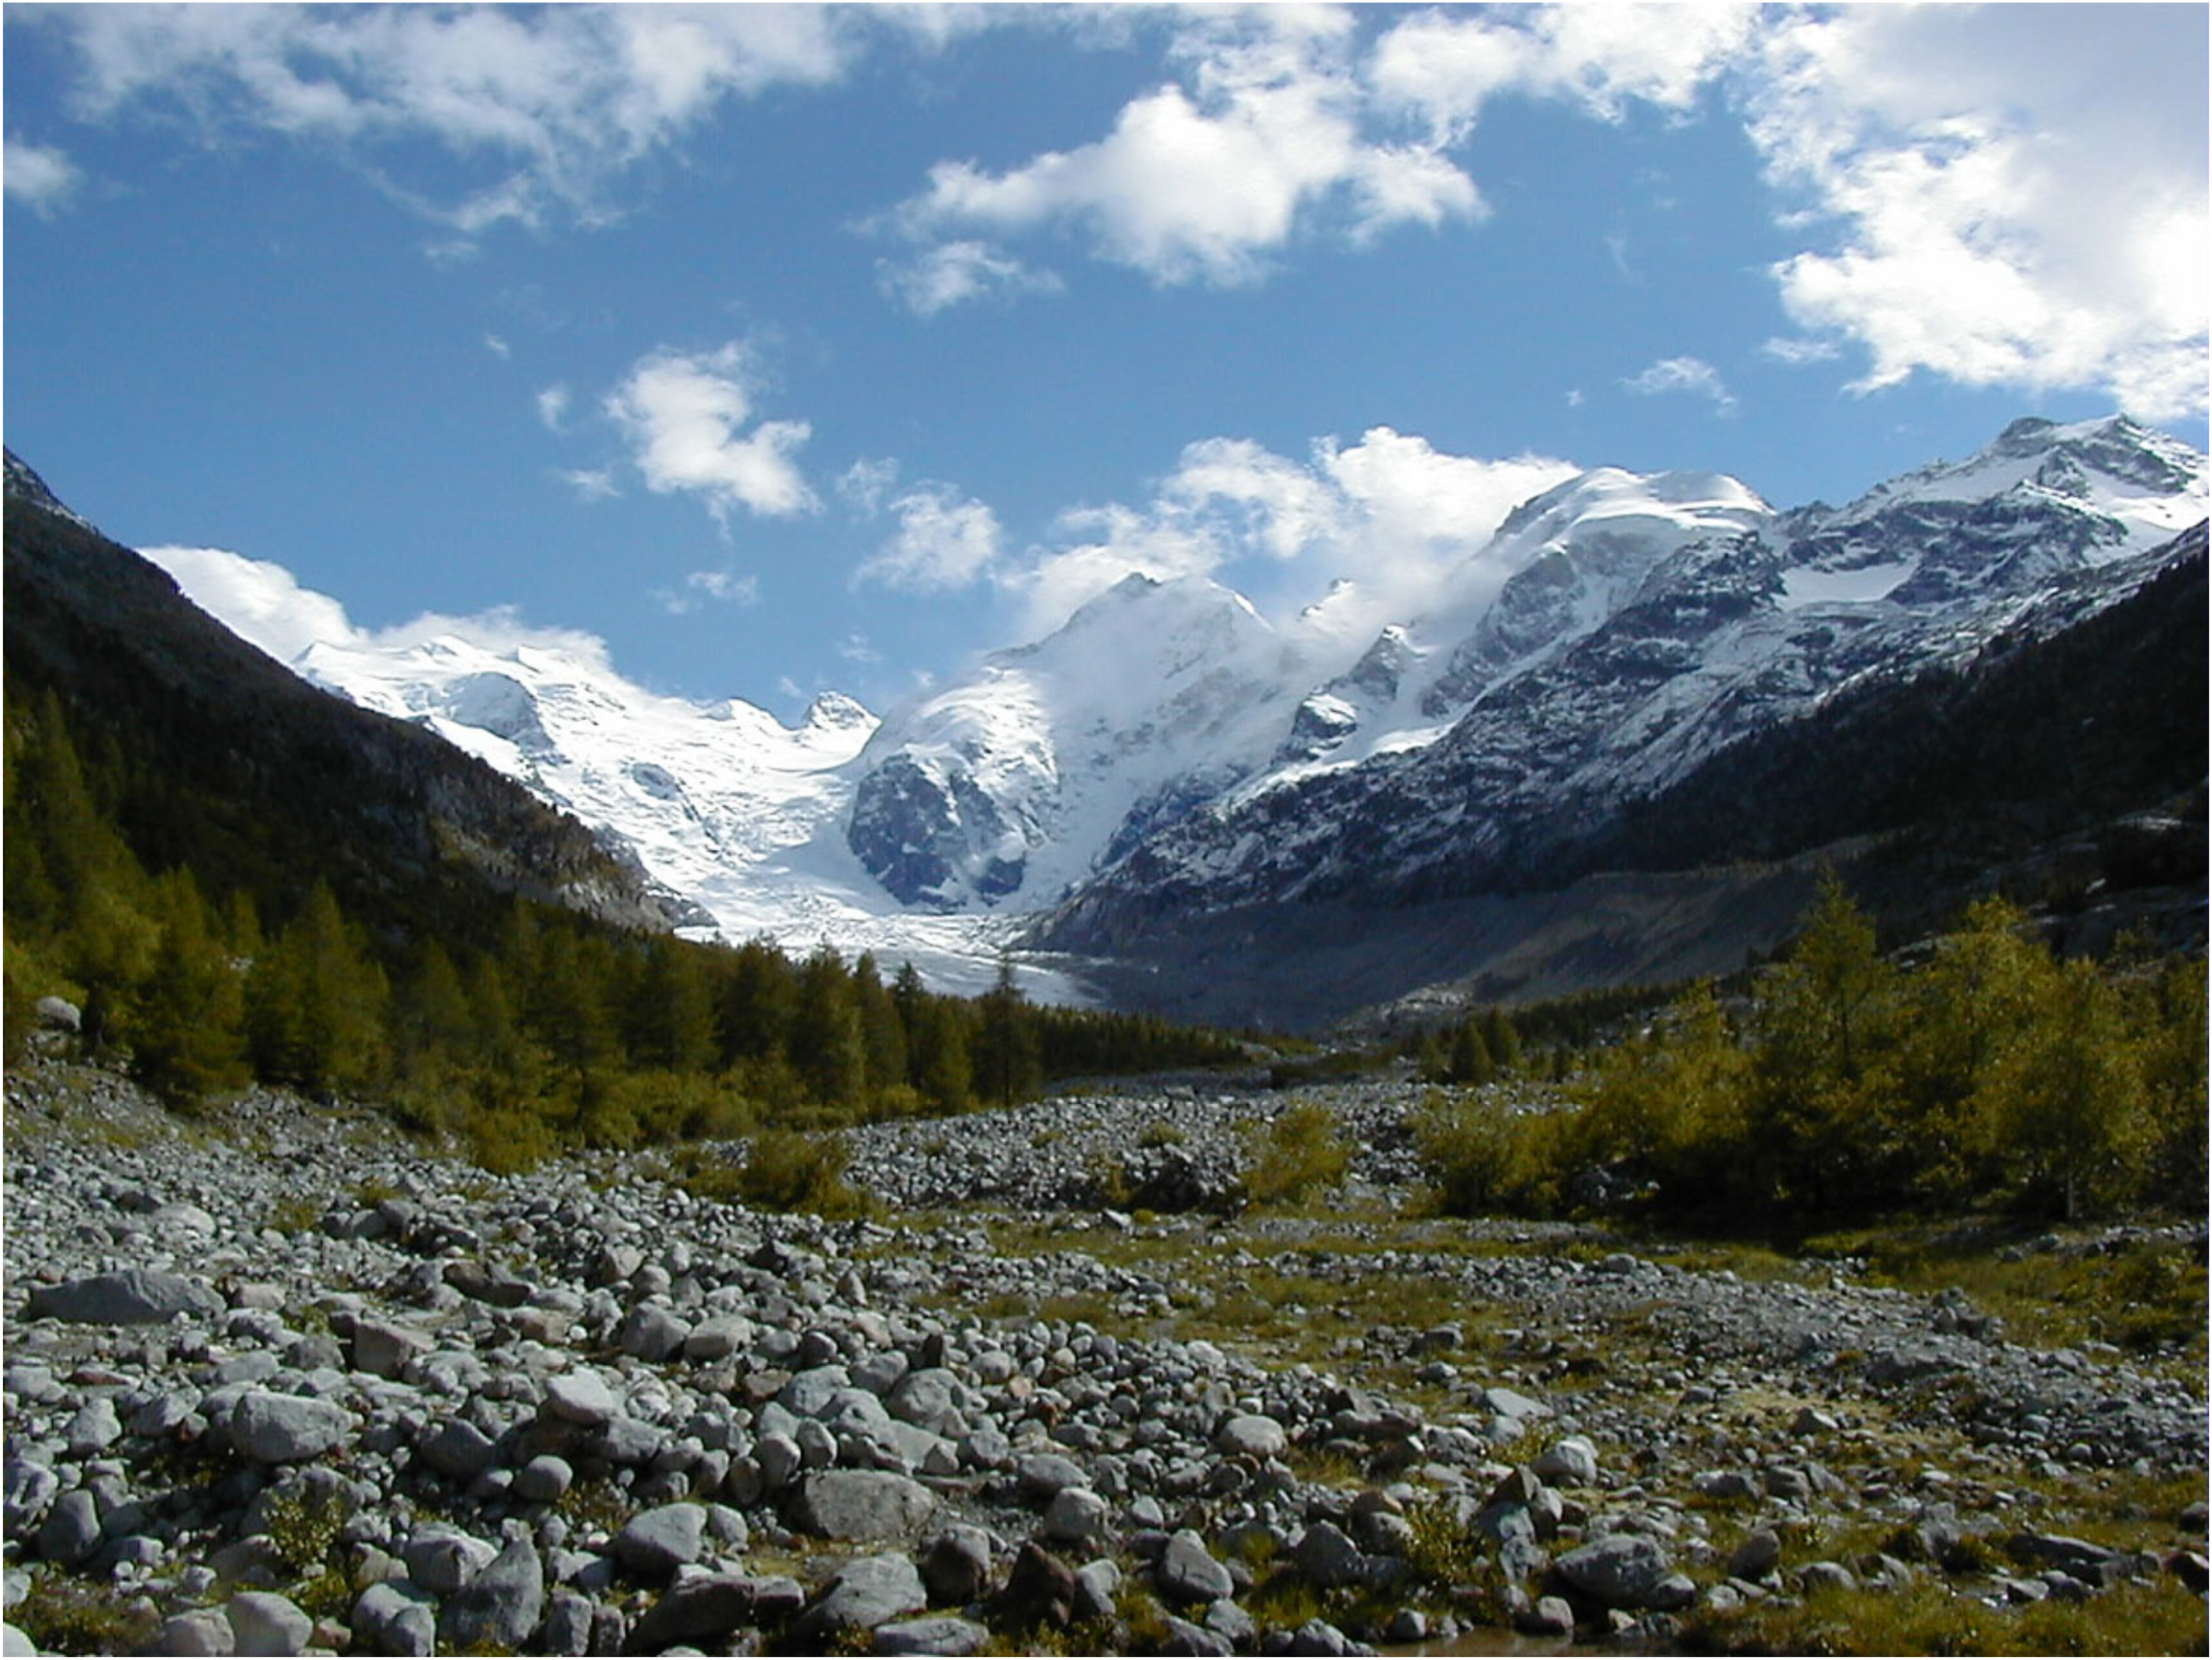 dating methods geochronology and landscape evolution definition